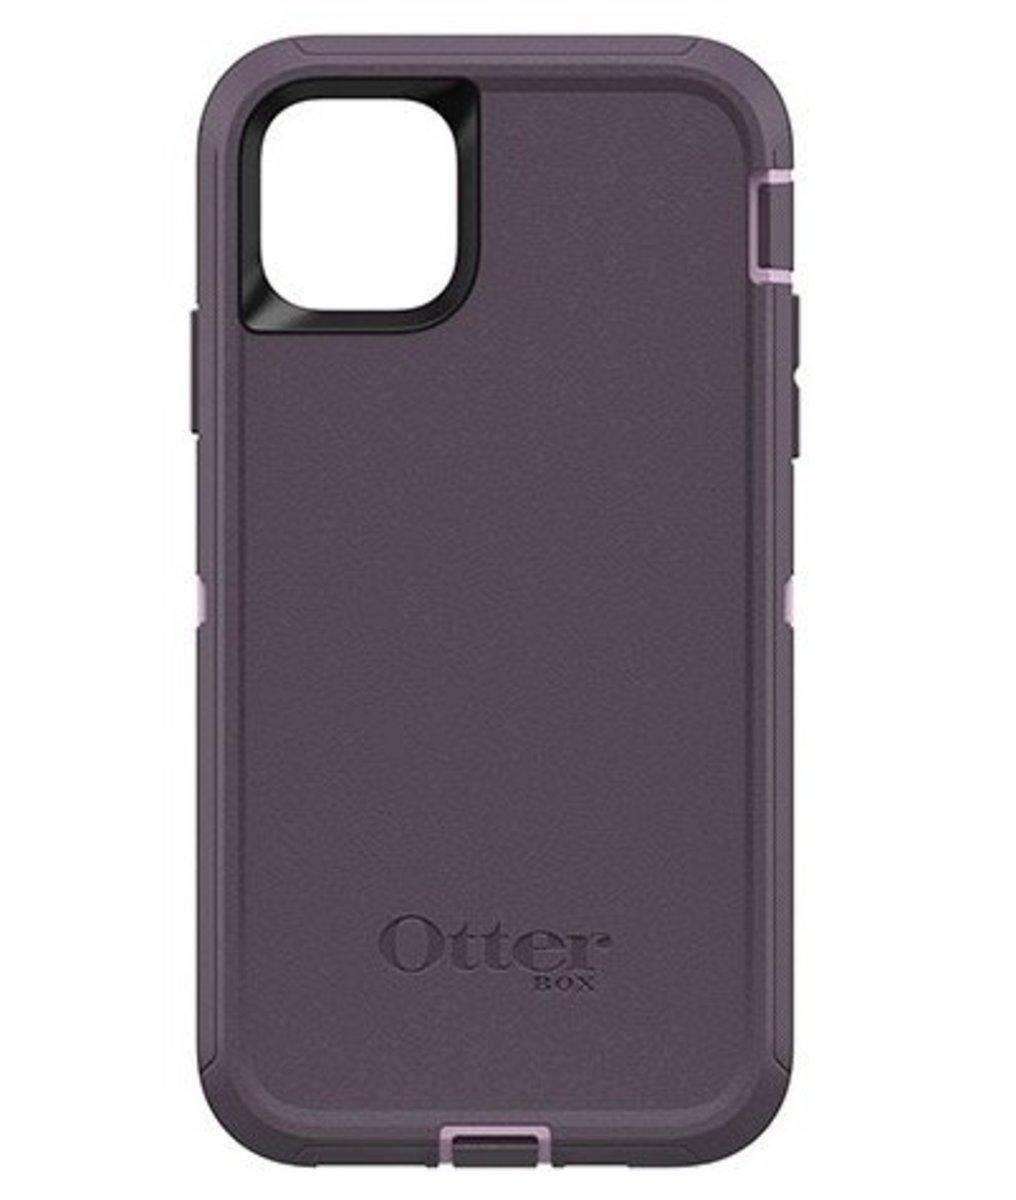 Defender防禦者系列iPhone 11 Pro Max 保護殼[Purple Nebula]